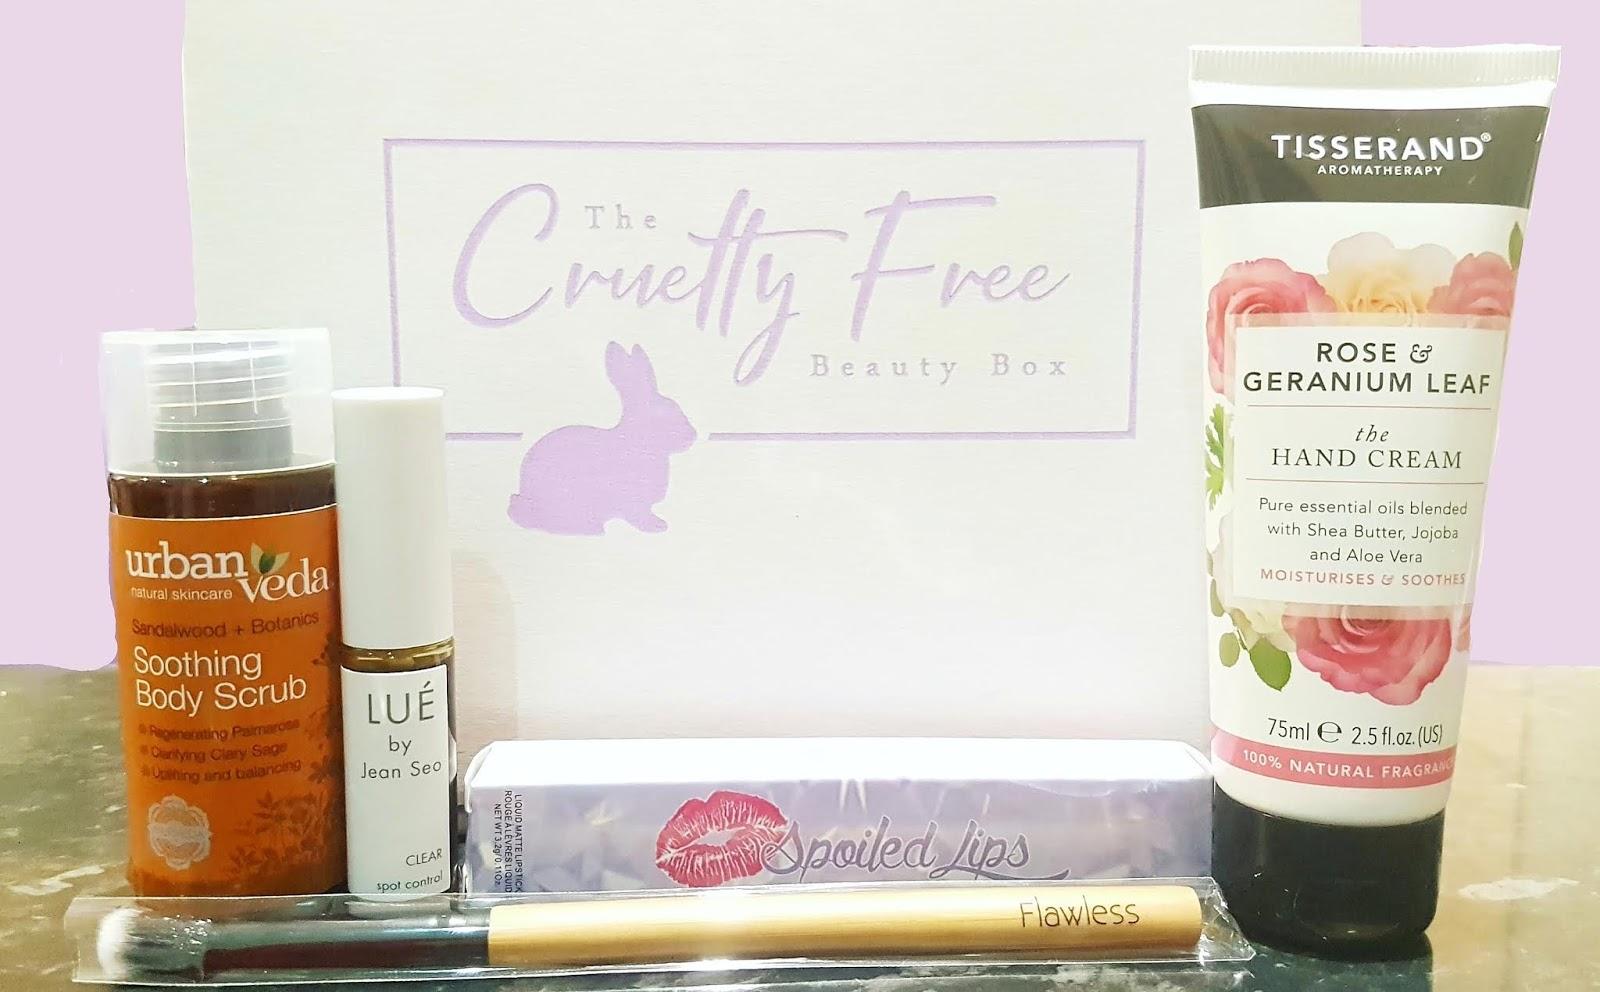 The Cruelty Free Beauty Box subscription